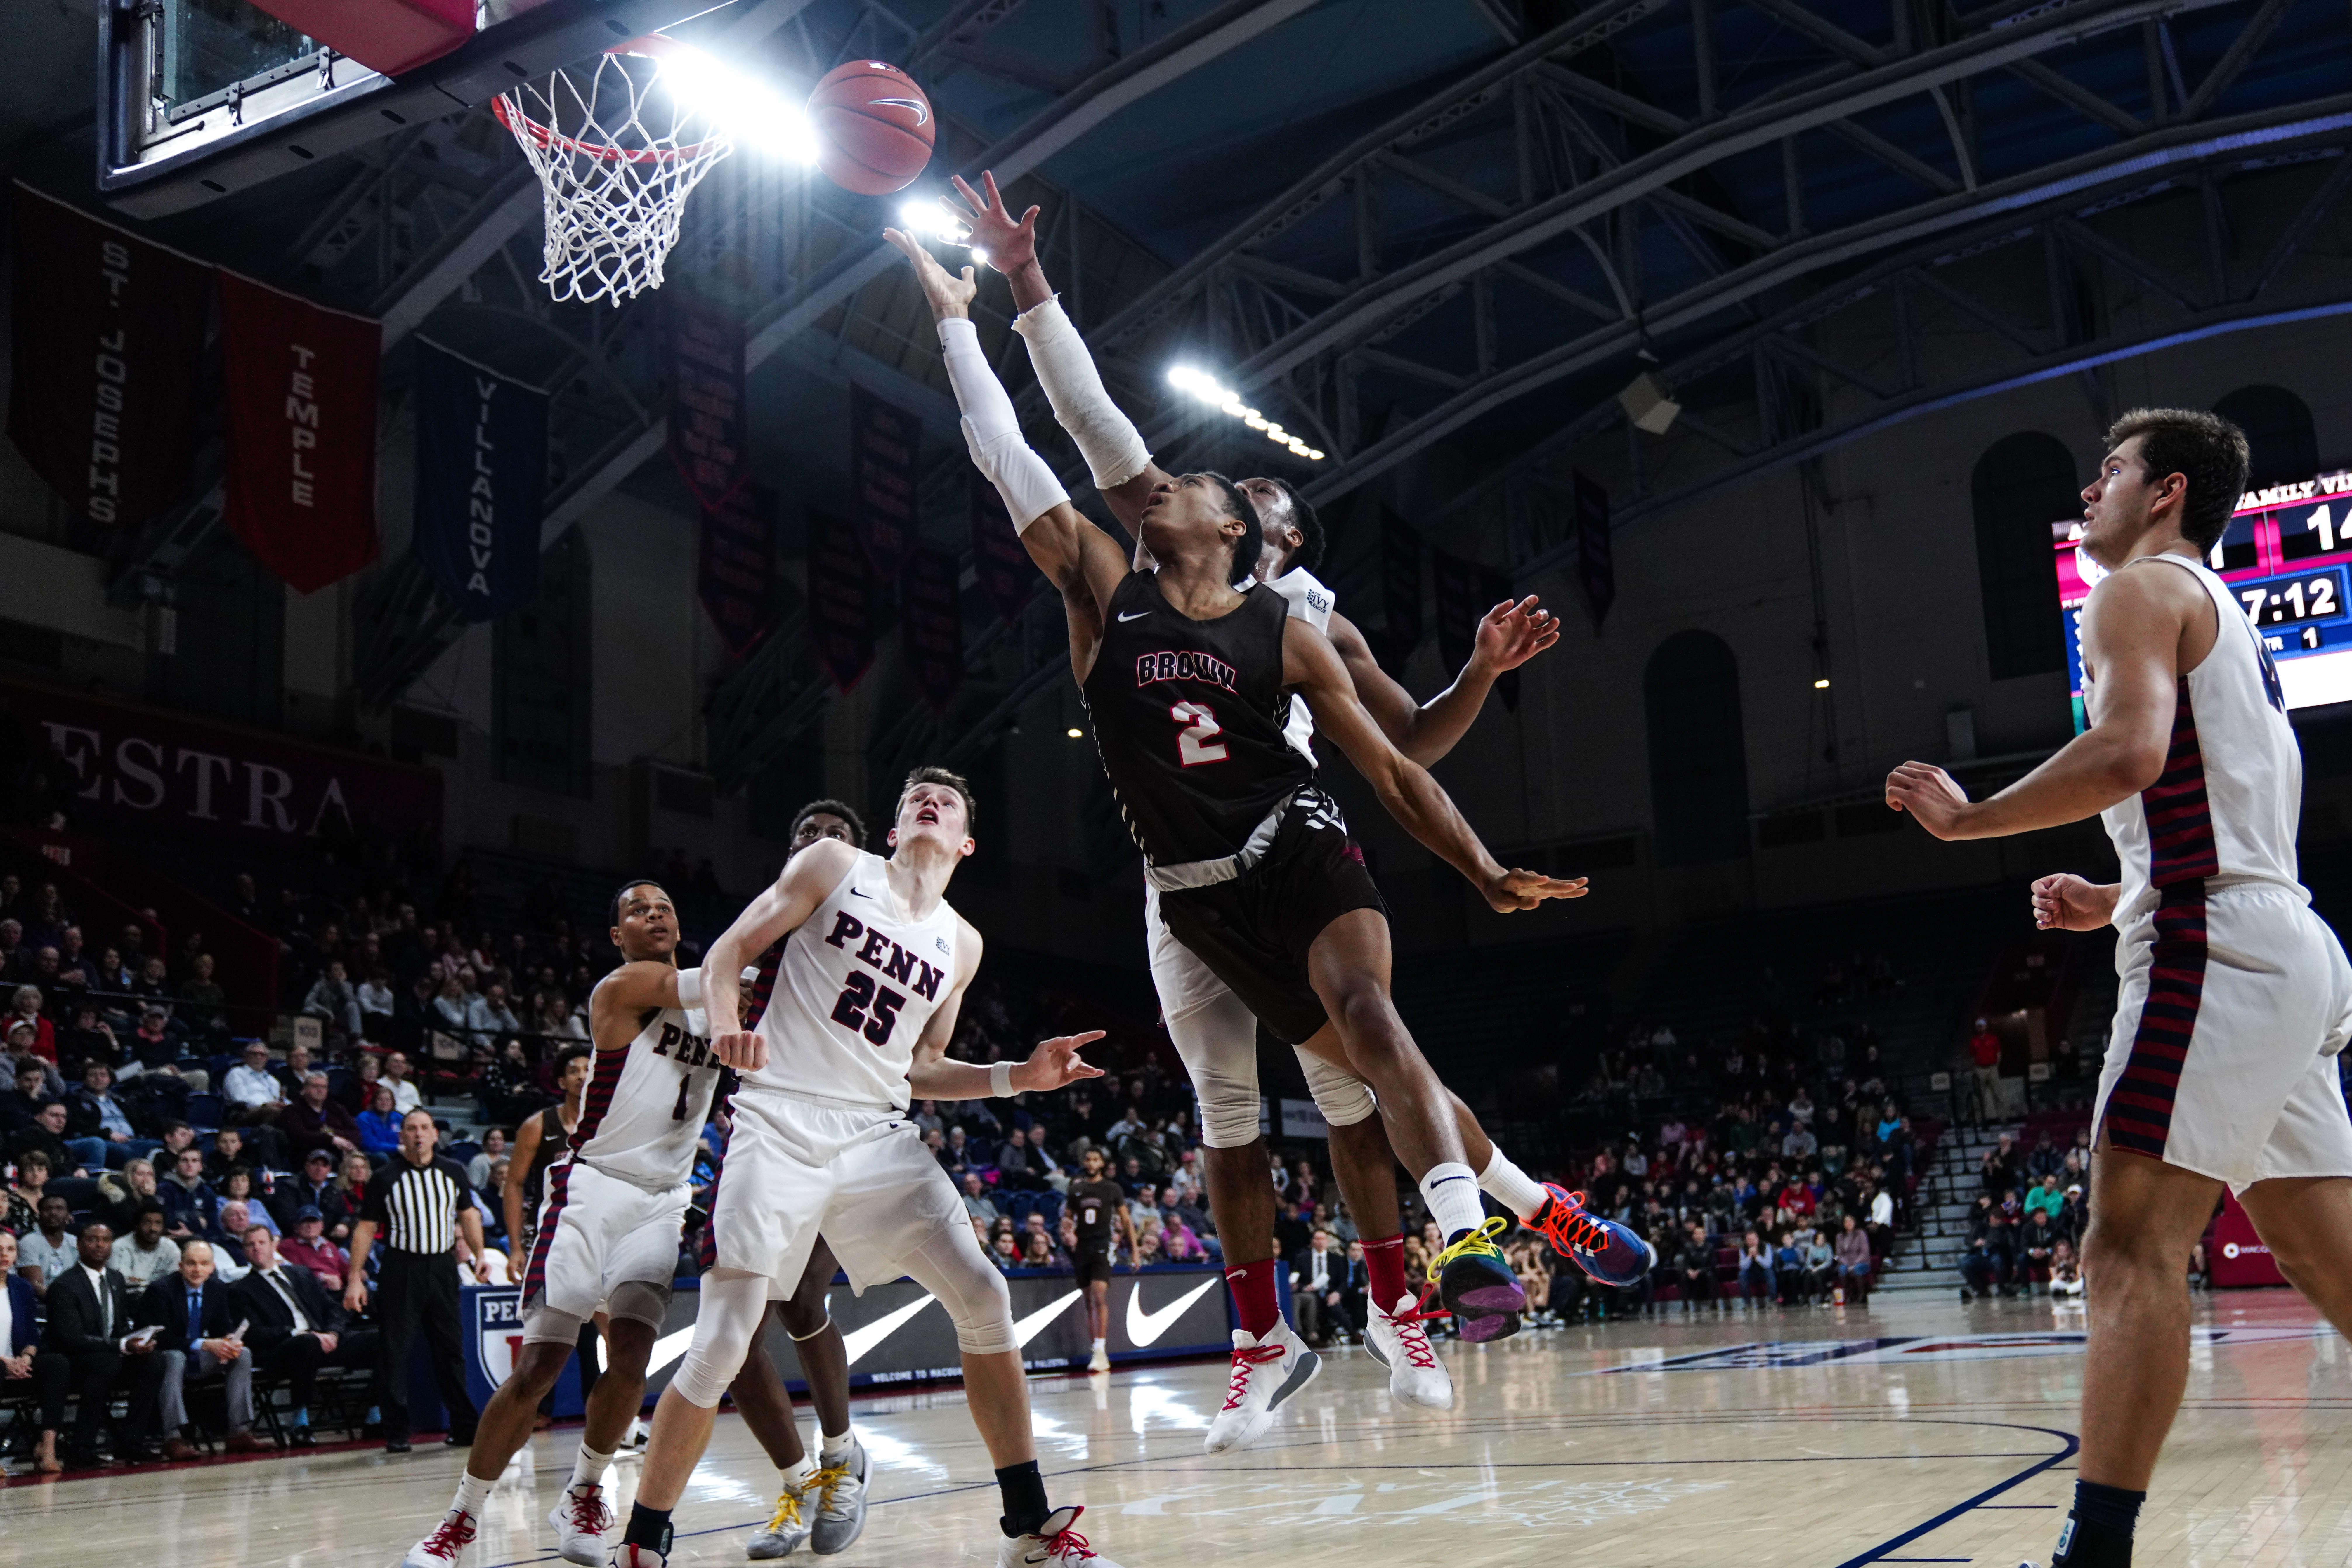 COLLEGE BASKETBALL: FEB 14 Brown at Penn